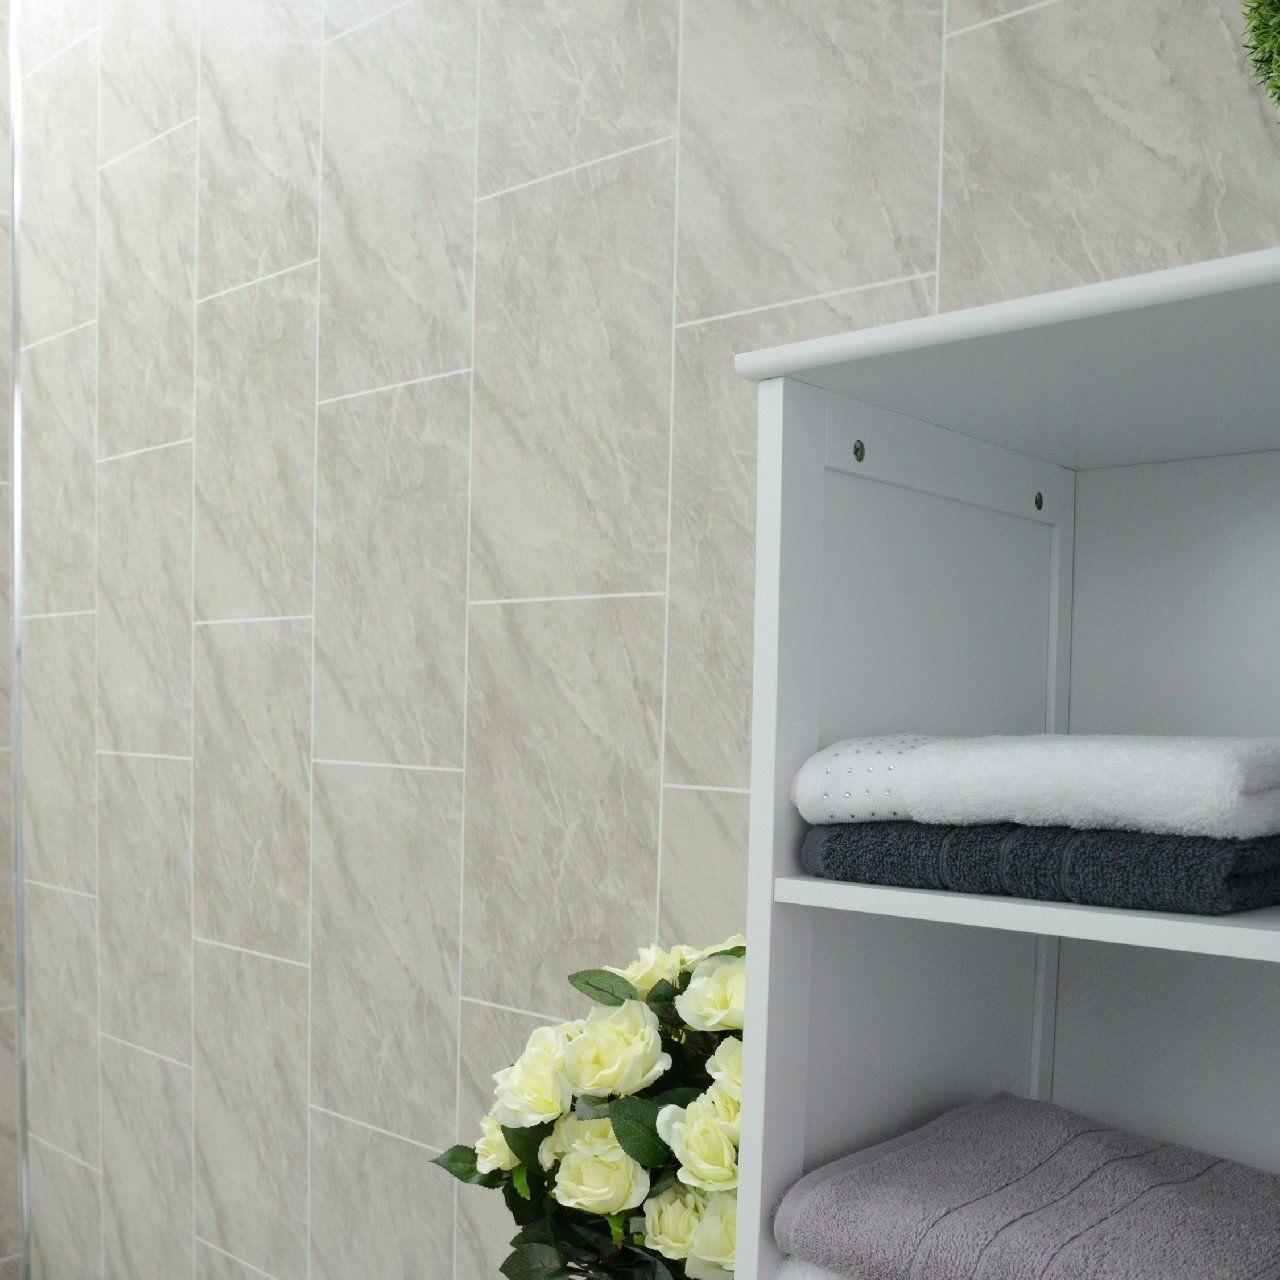 Grey marble bathroom wall panels tile effect cladding used